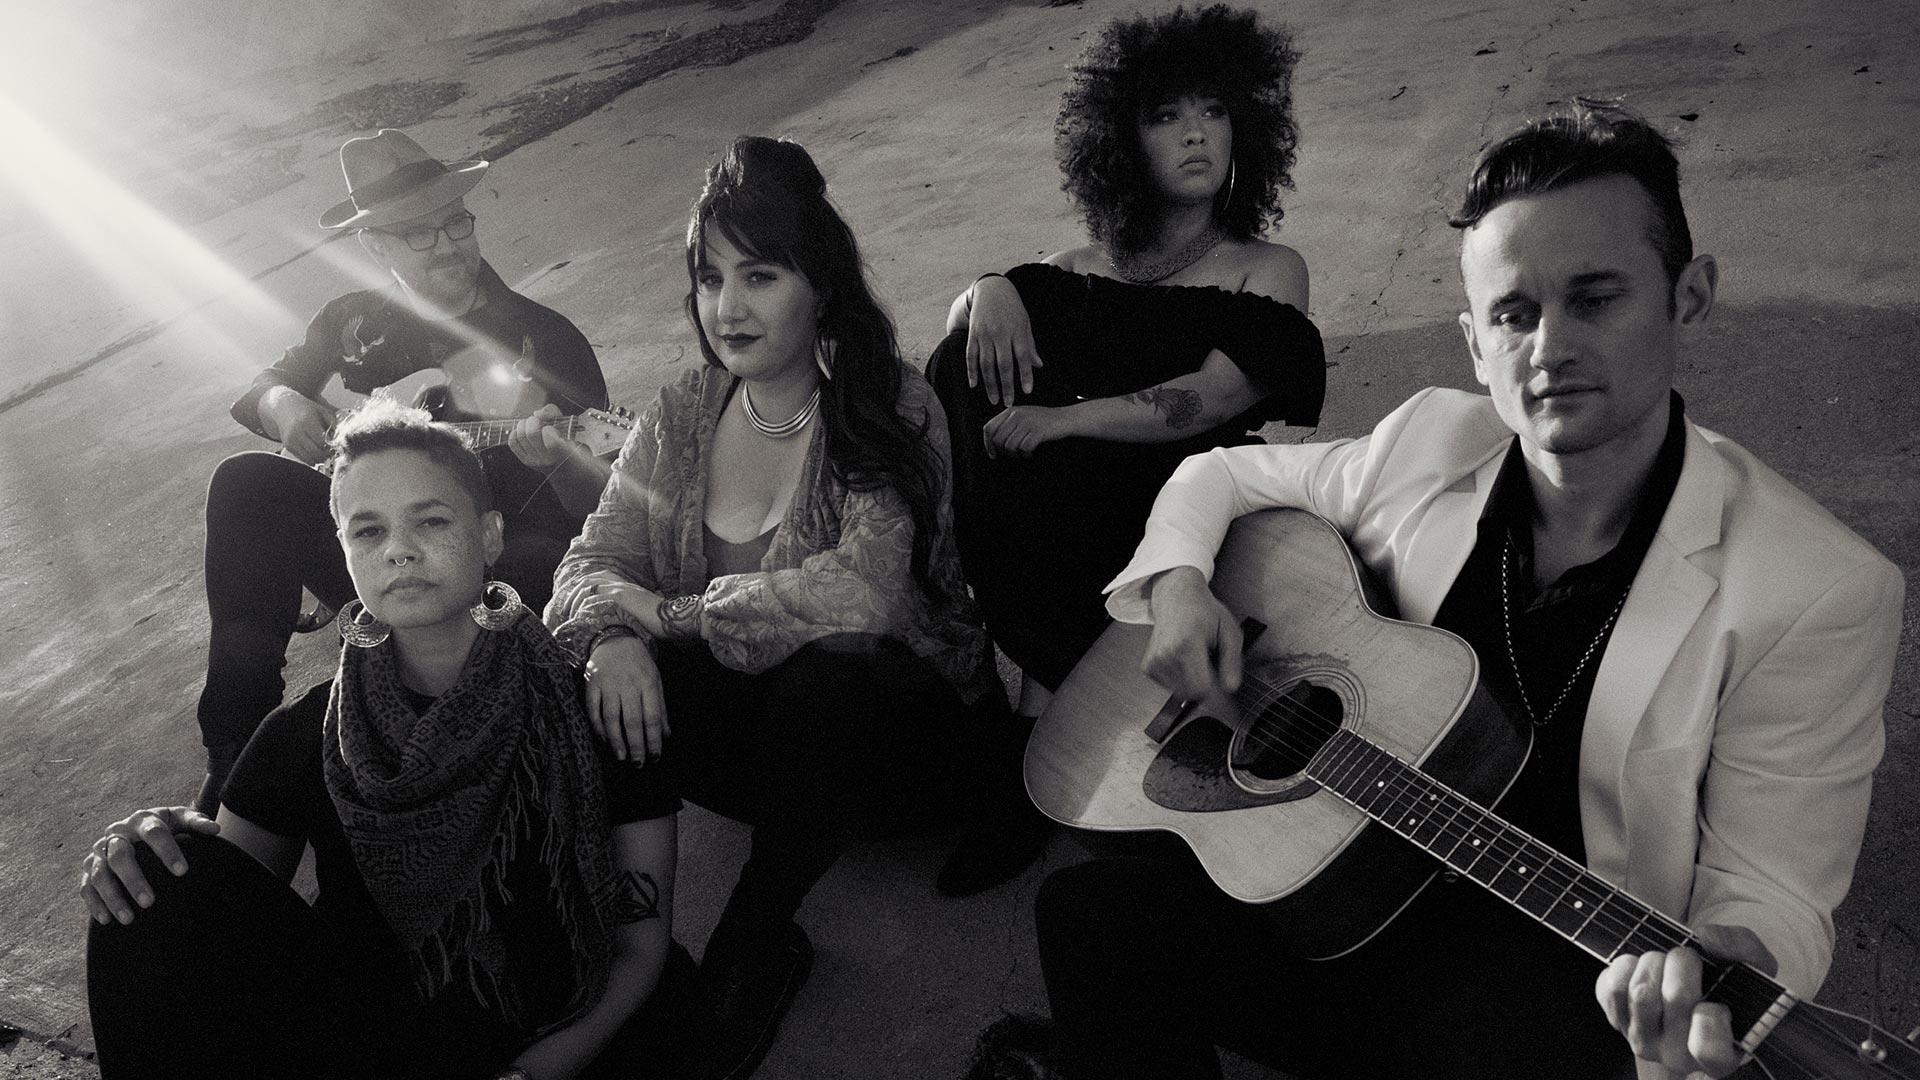 The Eagle Rock Gospel Singers | Grant Westhoff